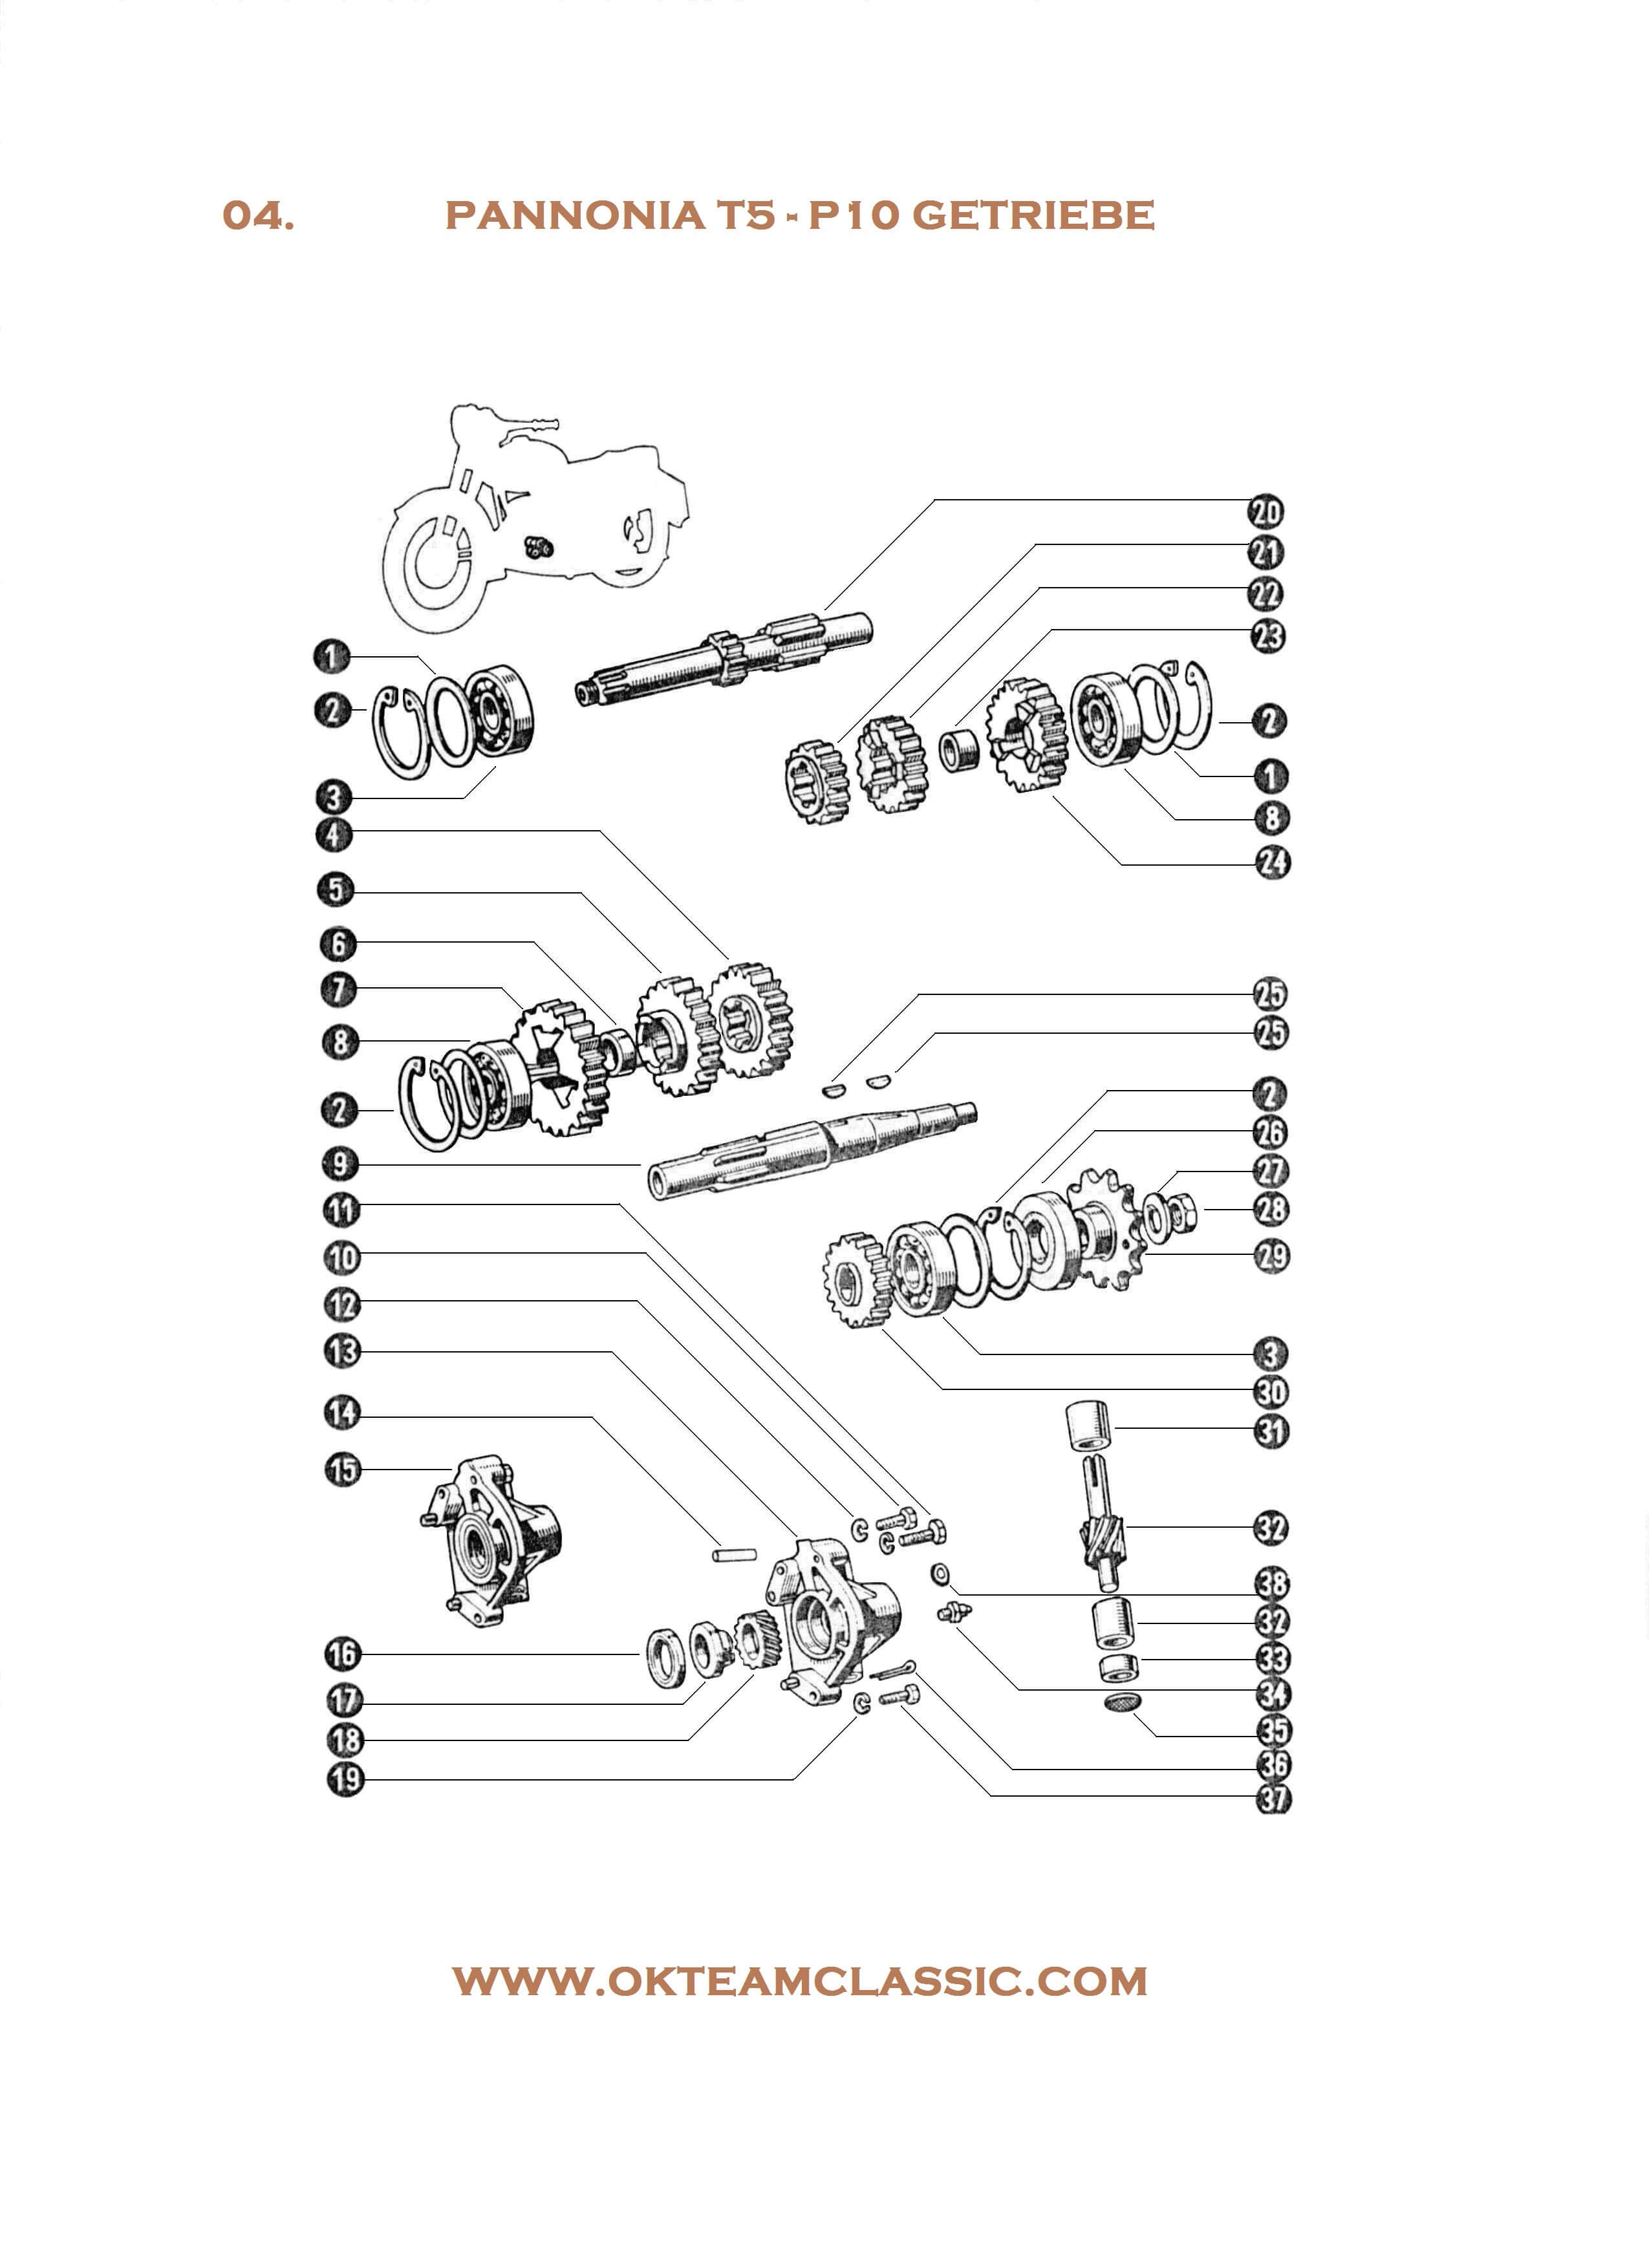 04. Getriebe